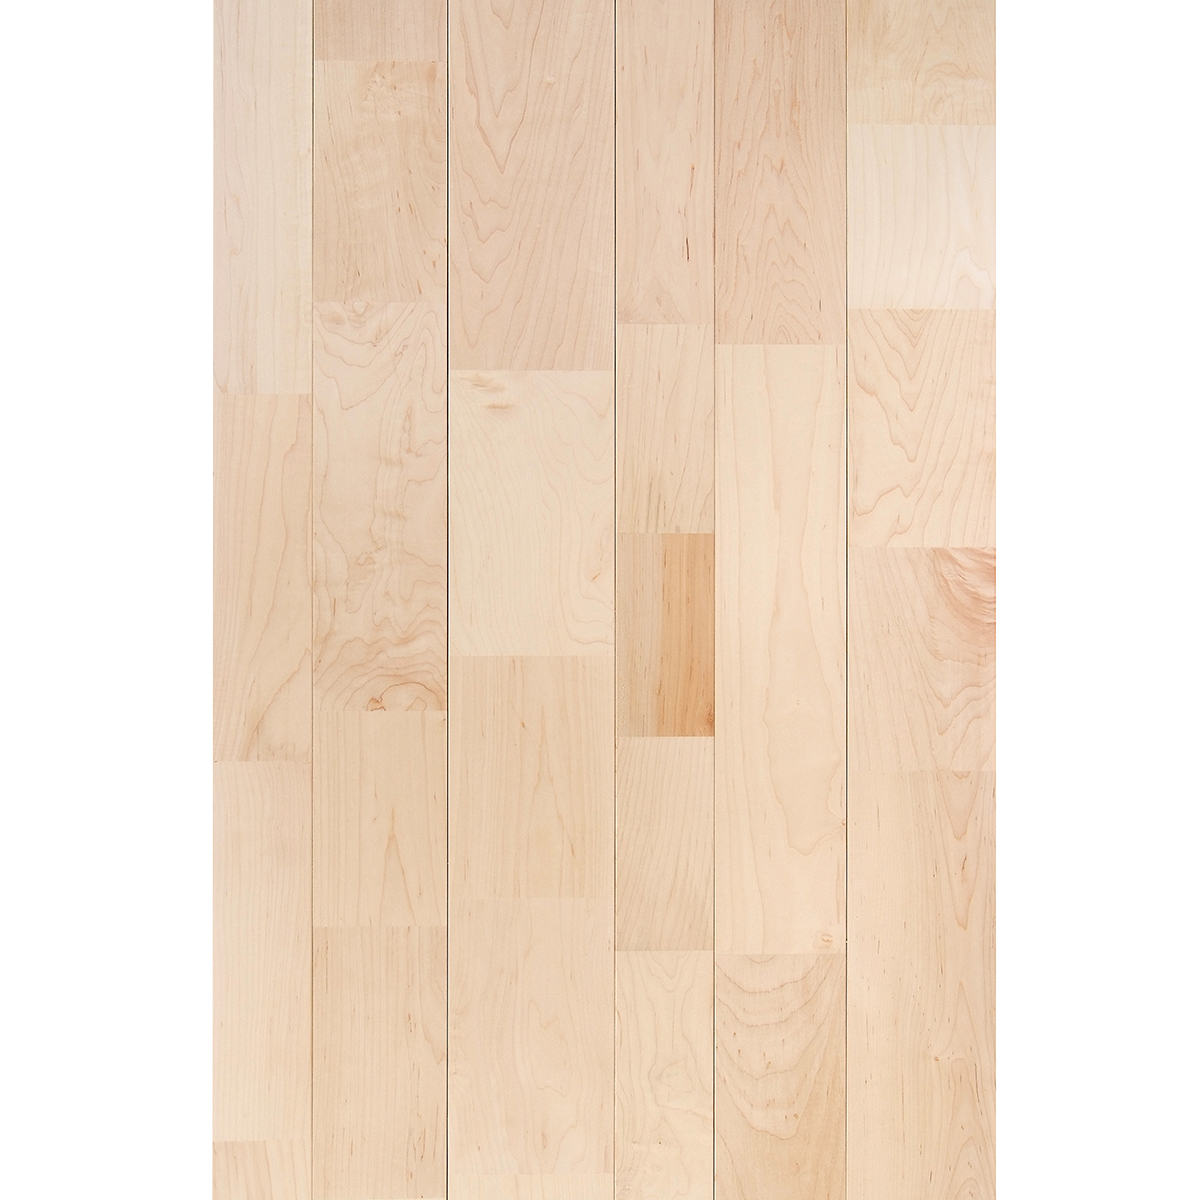 Finger Jointed Flooring : Hard maple quot finger jointed flooring